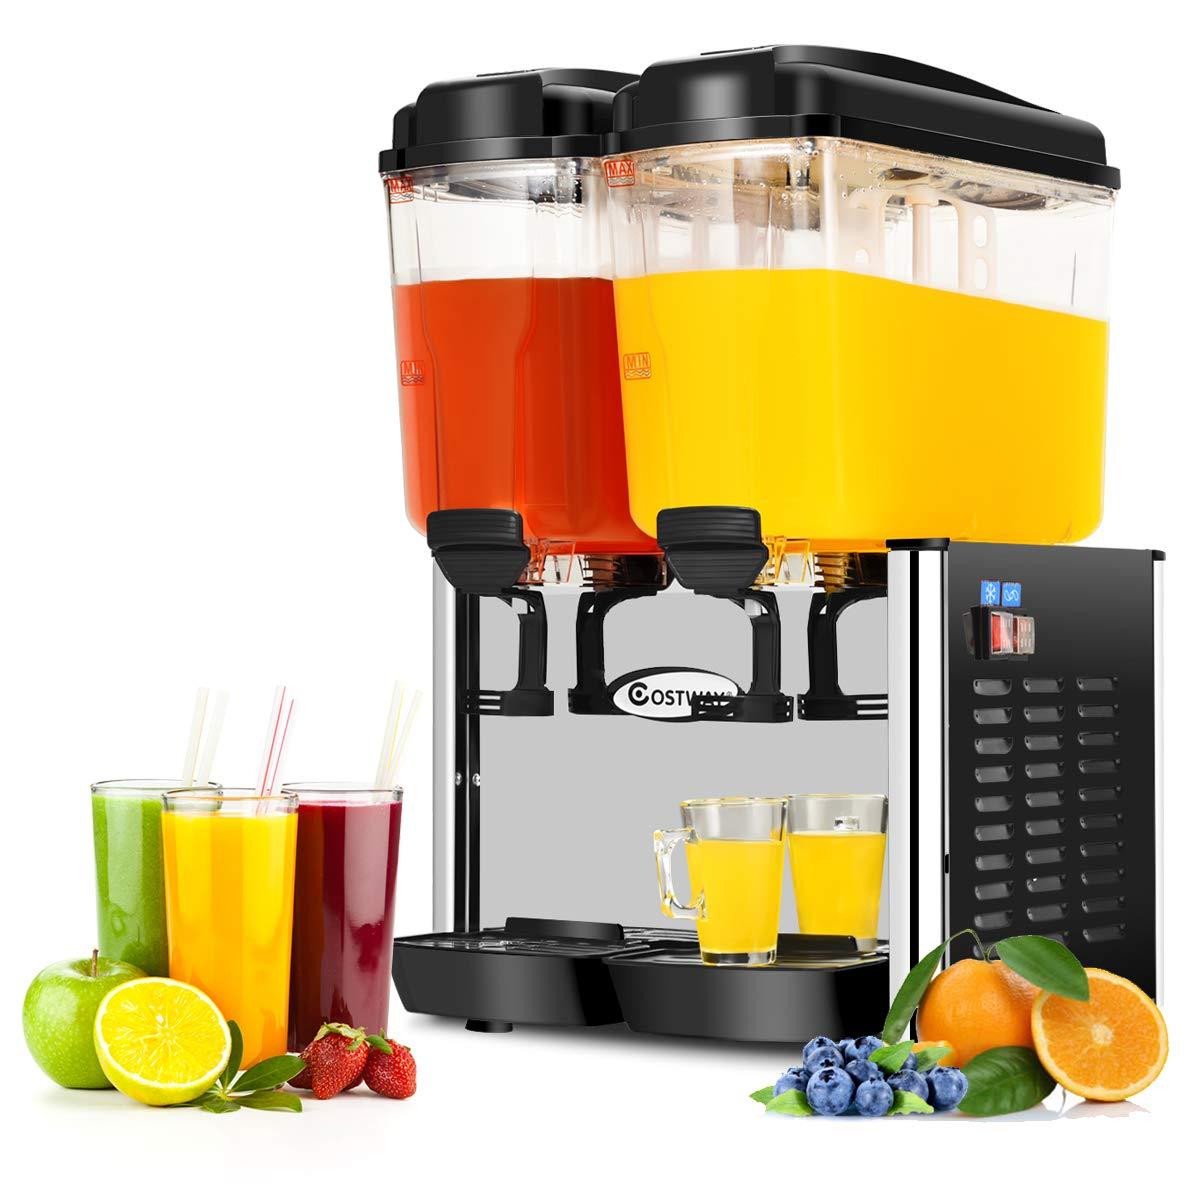 COSTWAY Commercial Beverage Dispenser Machine, 9.5 Gallon 2 Tank Juice Dispenser for Cold Drink, 350W Stainless Steel Finish Food Grade Material Ice Tea Drink Dispenser, 18 Liter Per Tank (Black)